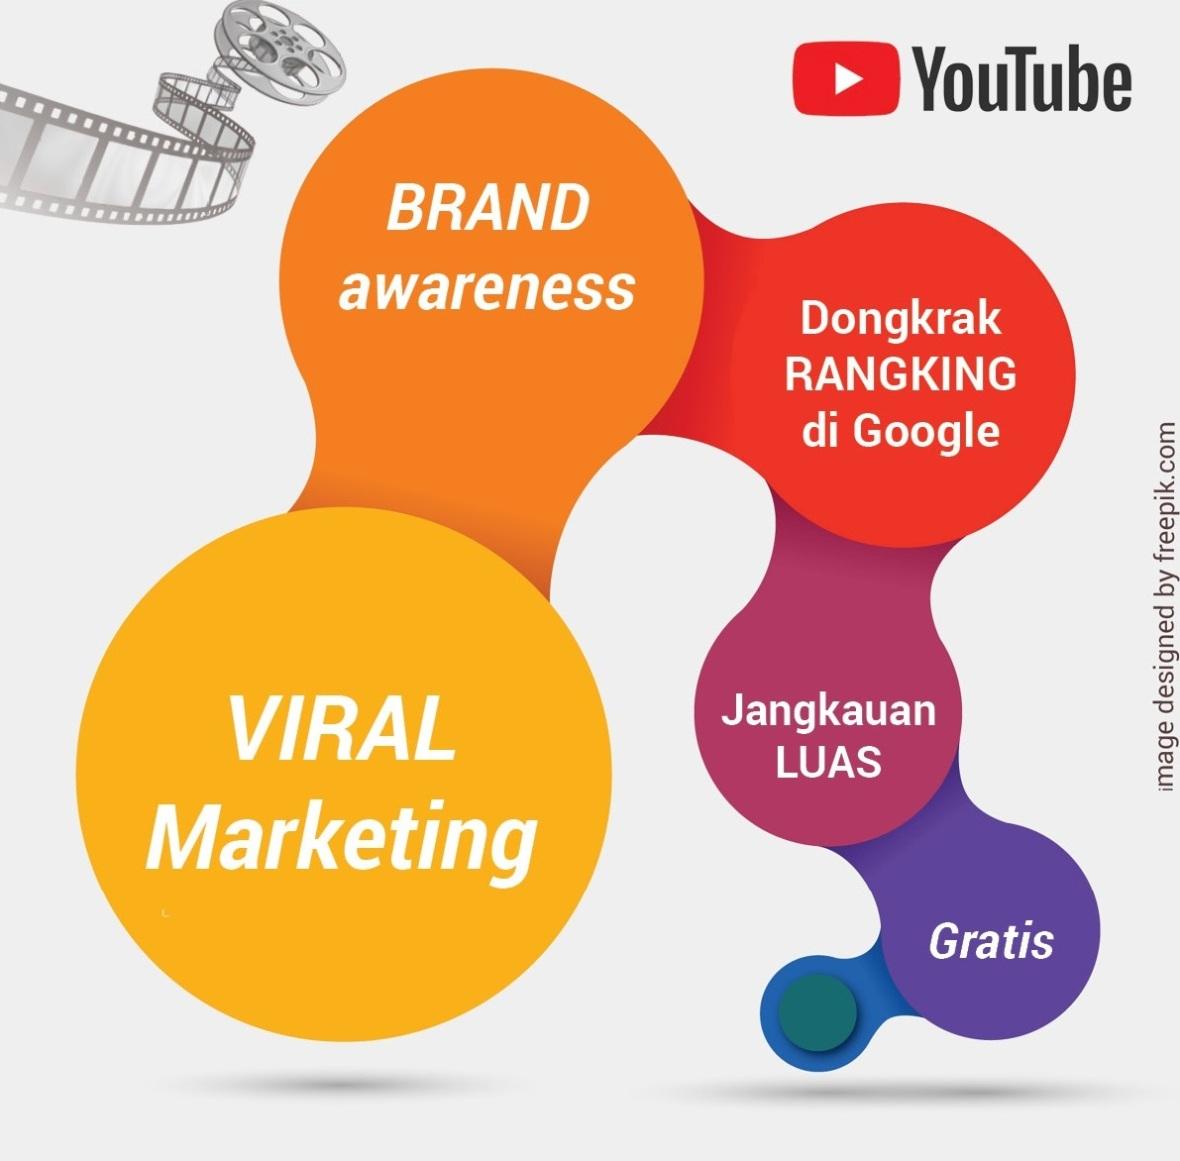 youtube 4 m3